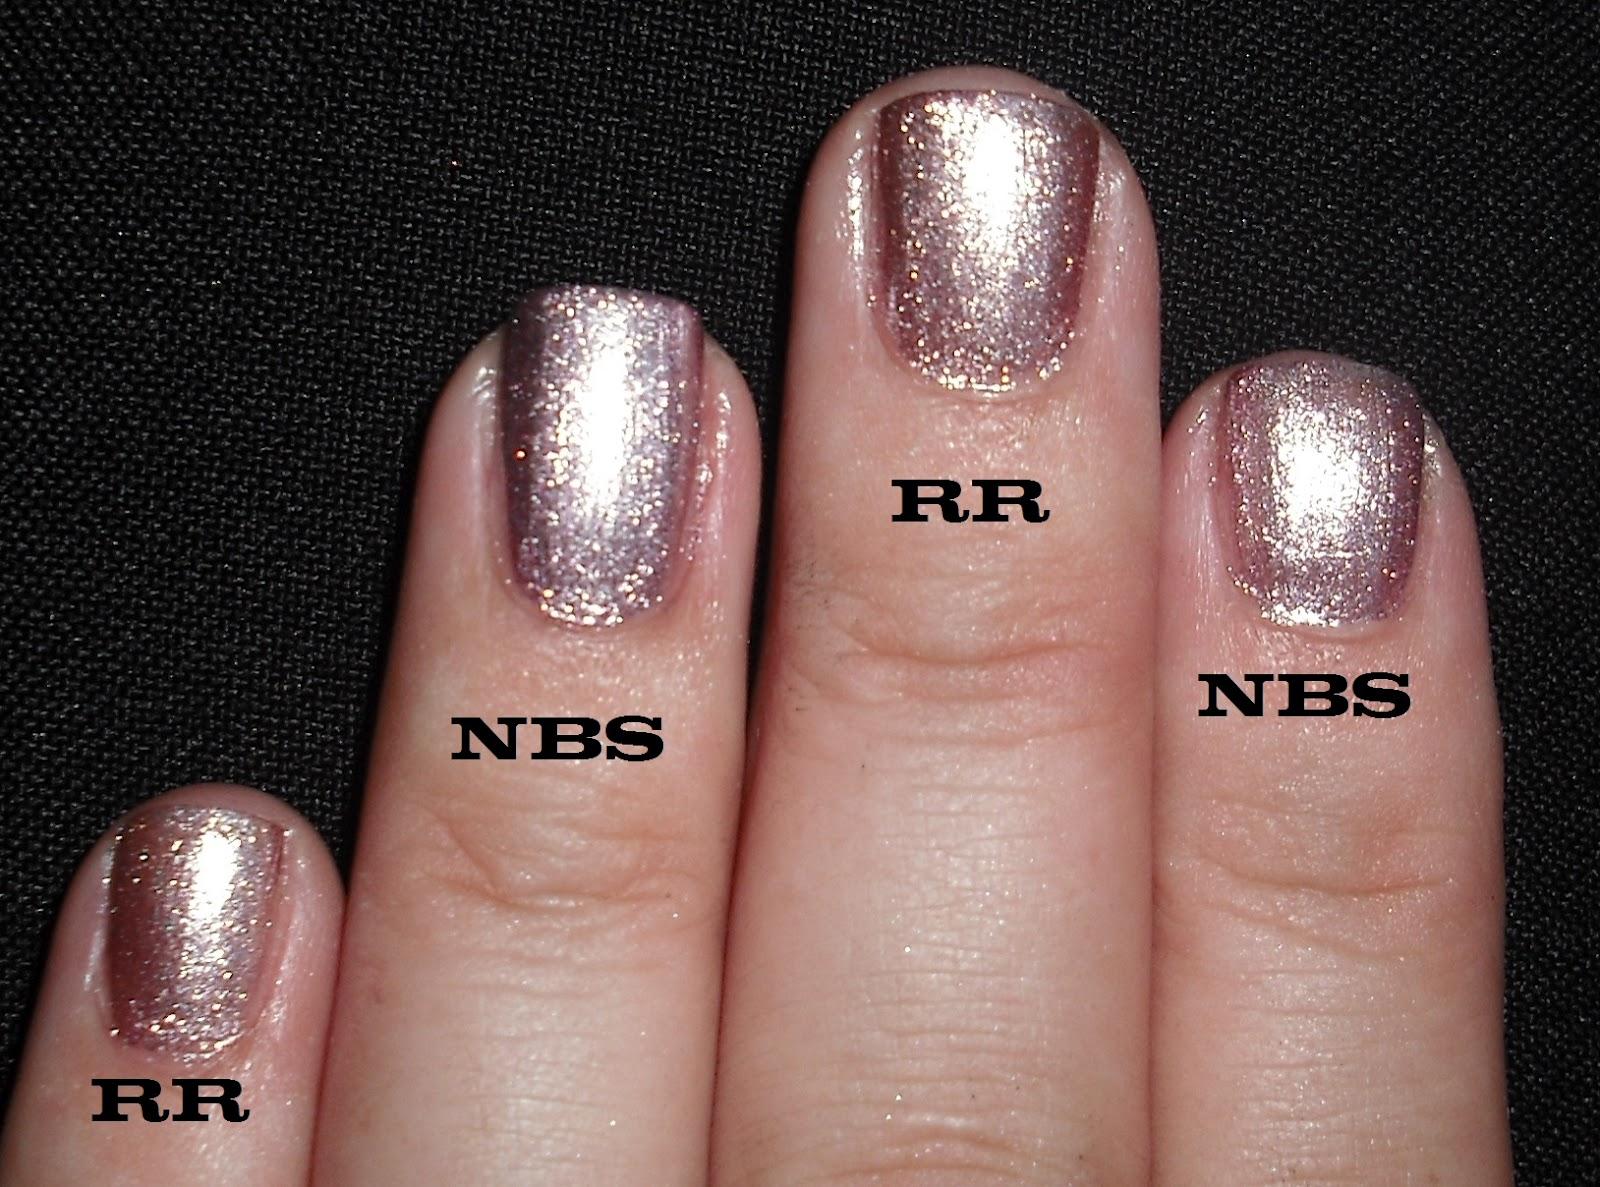 Wendy\'s Delights: OPI Rosy Reflection vs Nails Inc New Bond Street